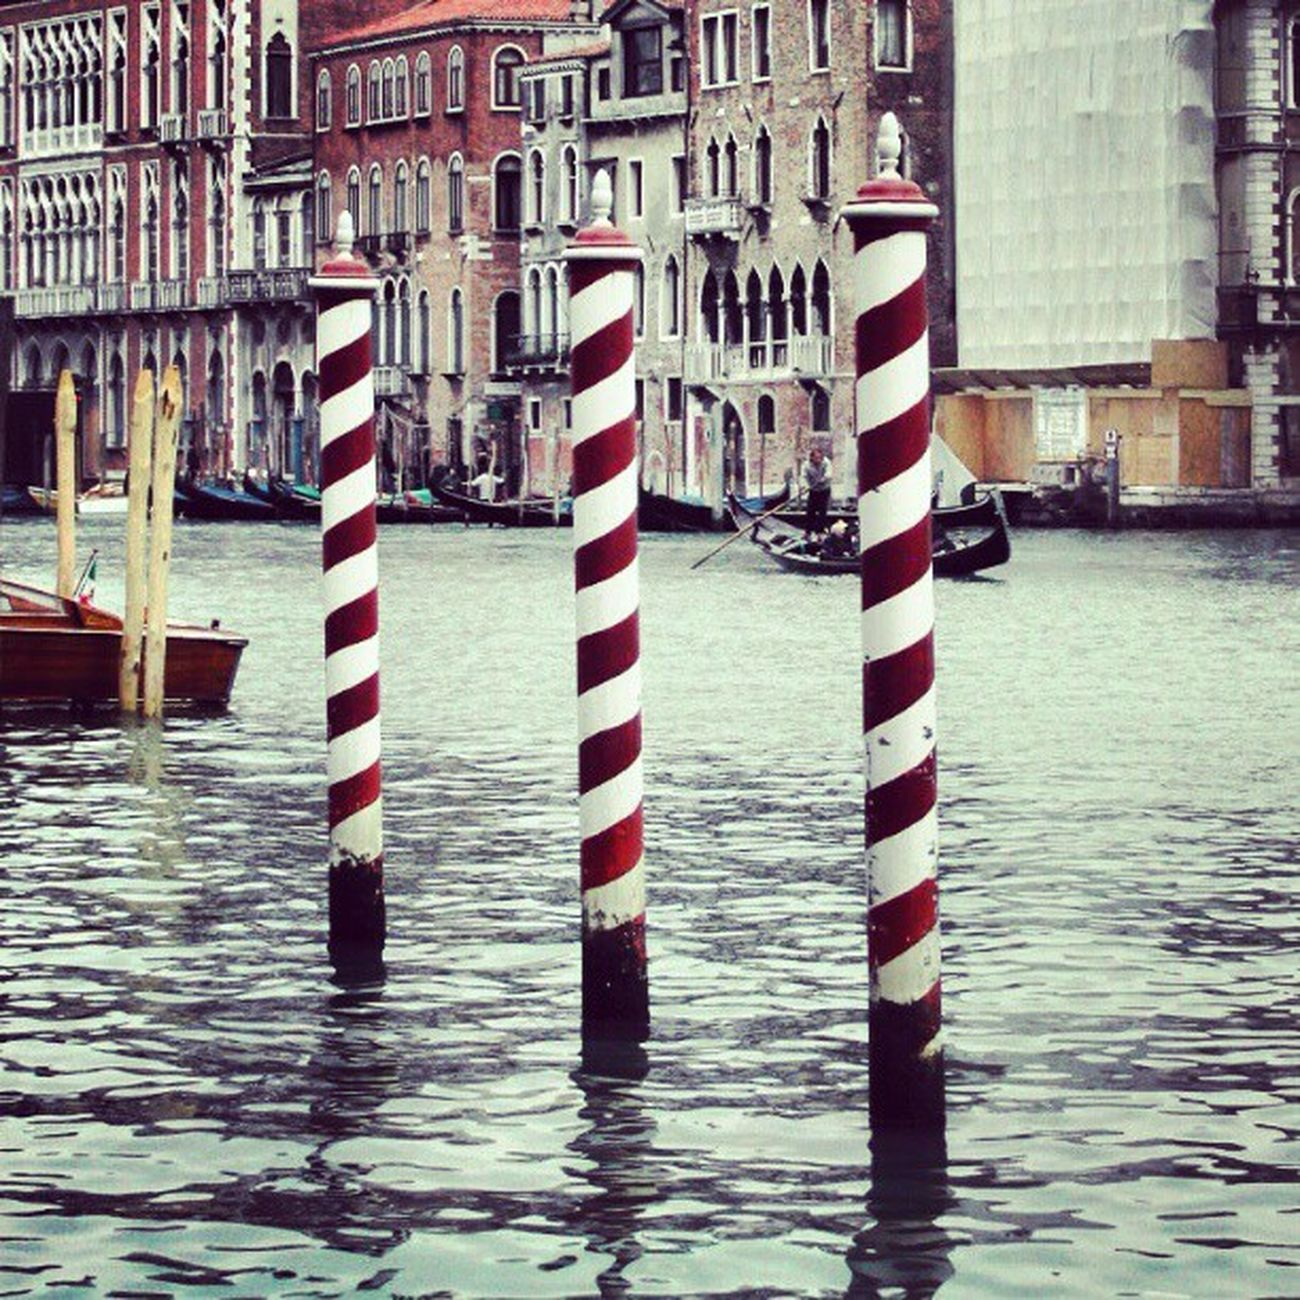 #venice #water #igers #igfamos #instagood Water Venice Igers Instagood Igfamos